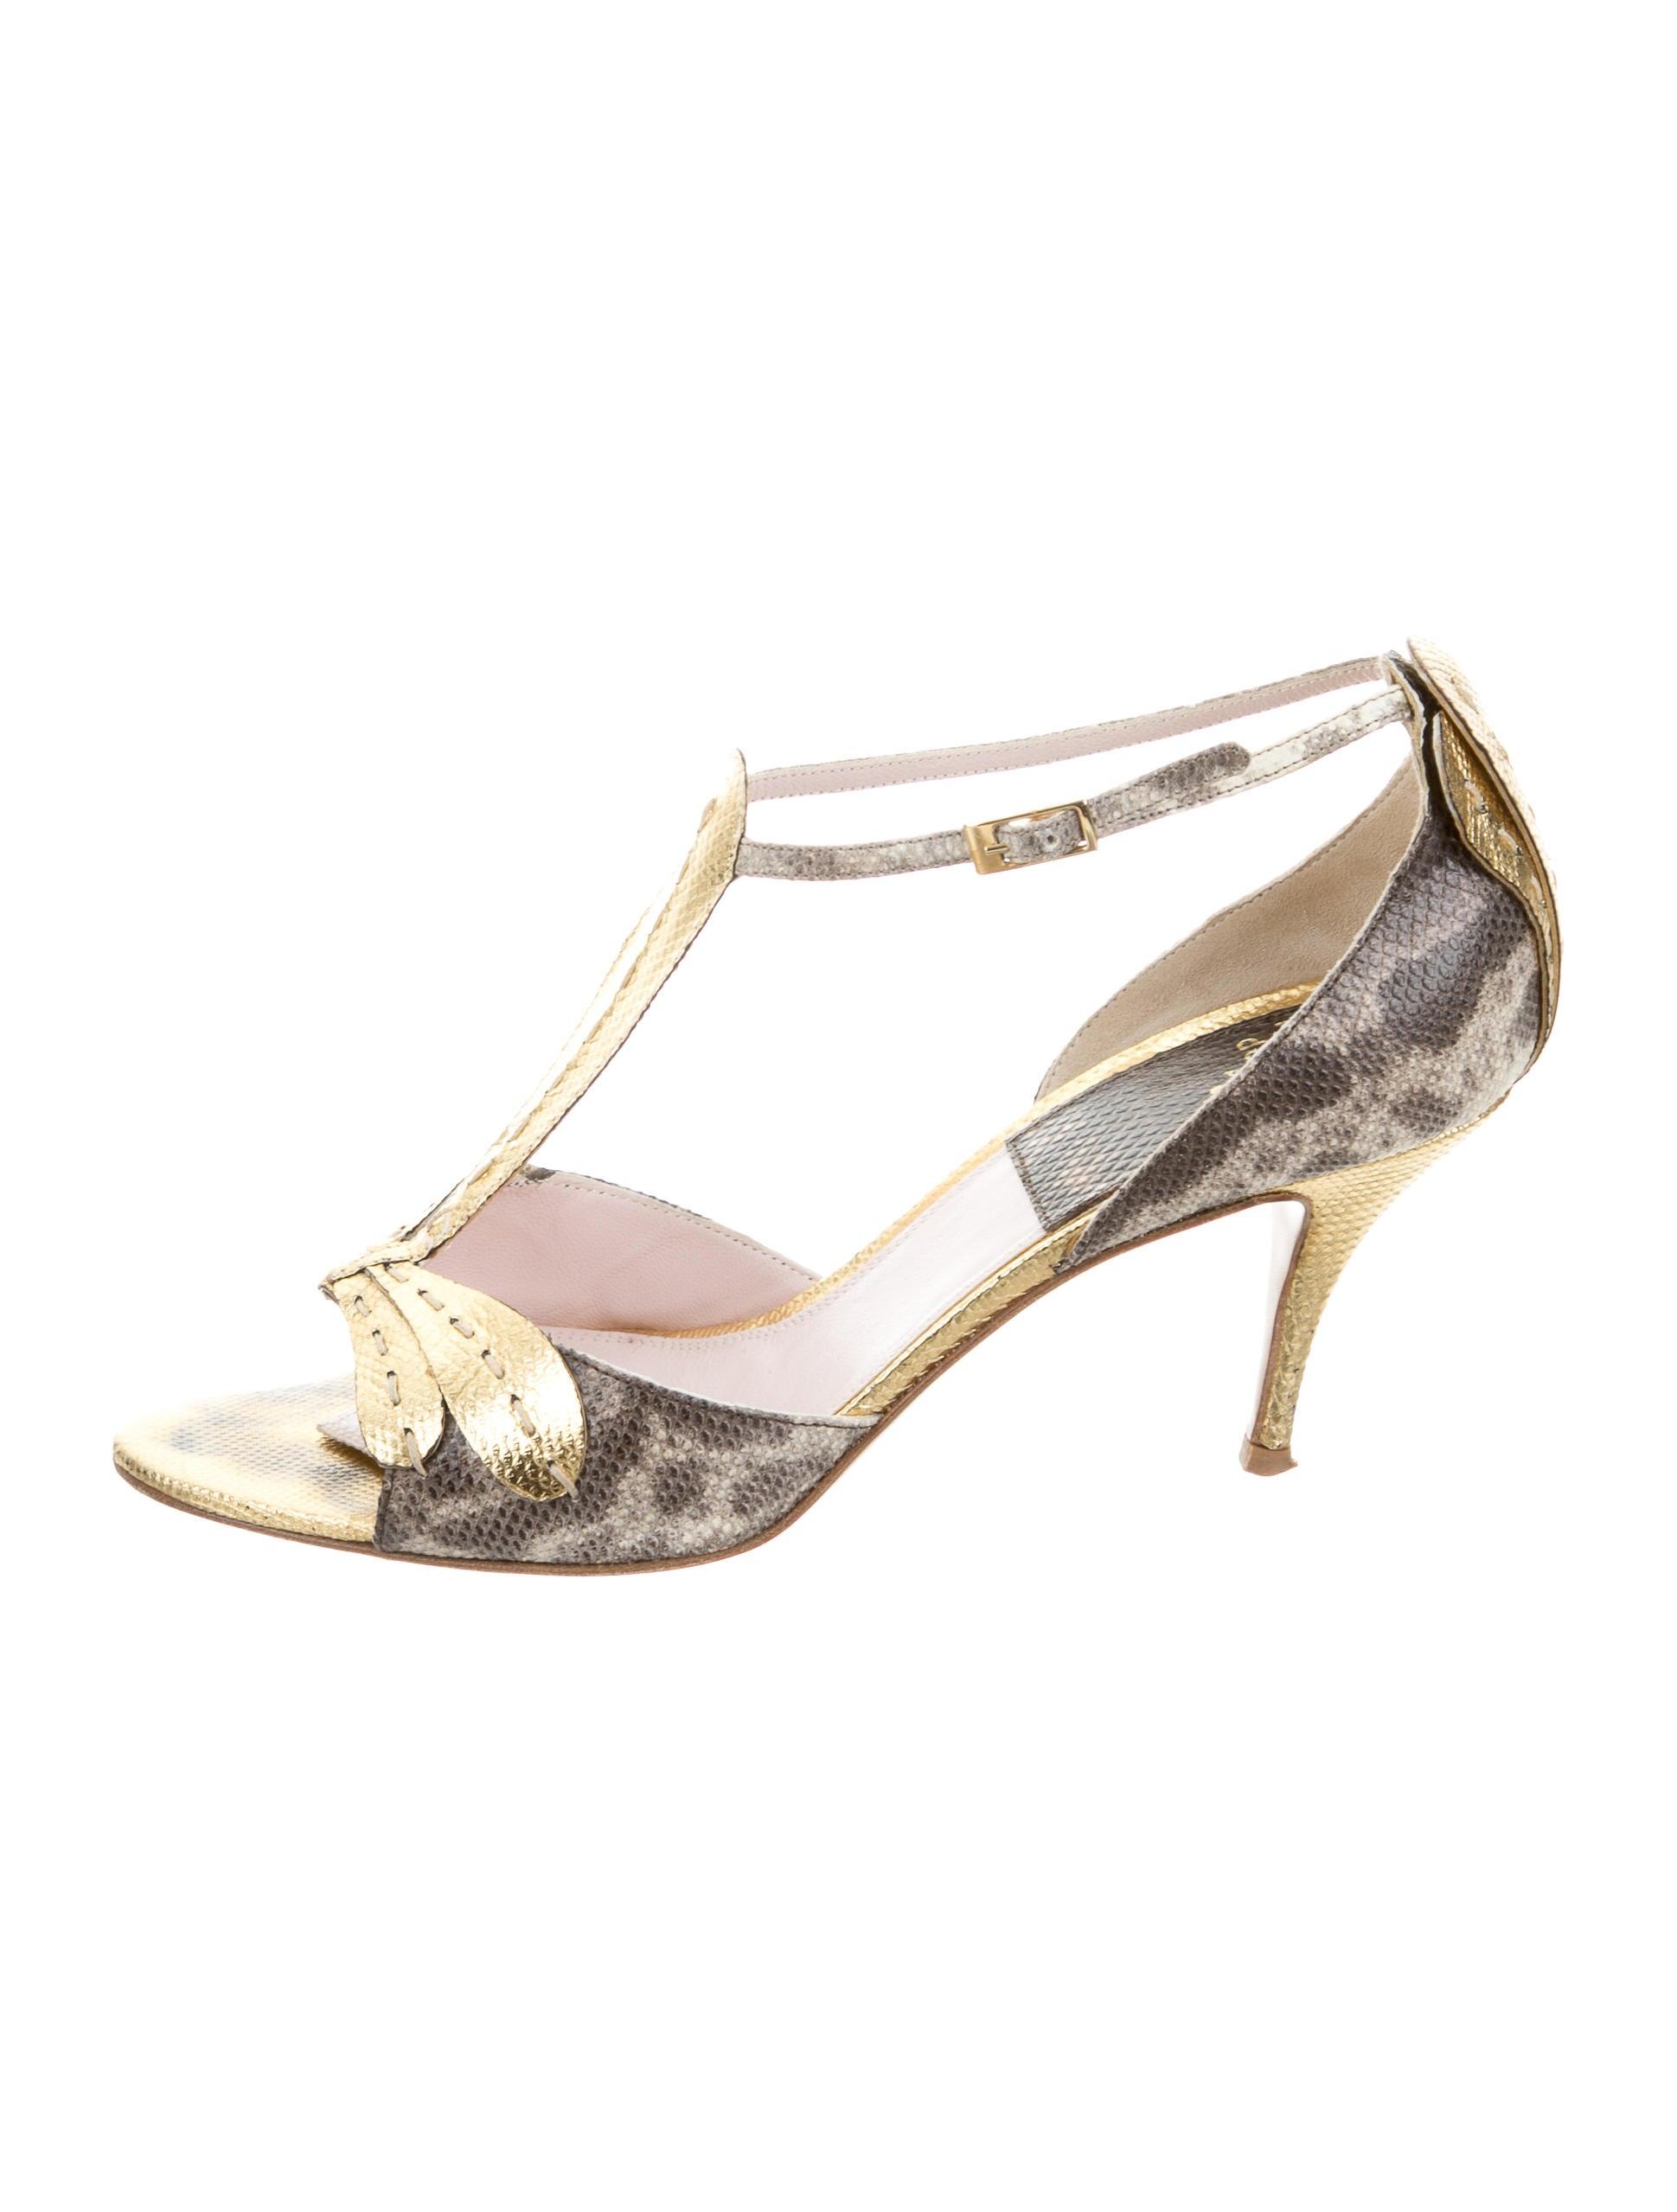 Laurence Dacade Karung T-Strap Sandals exclusive store cheap online 100% original cheap online newest online YlDmN